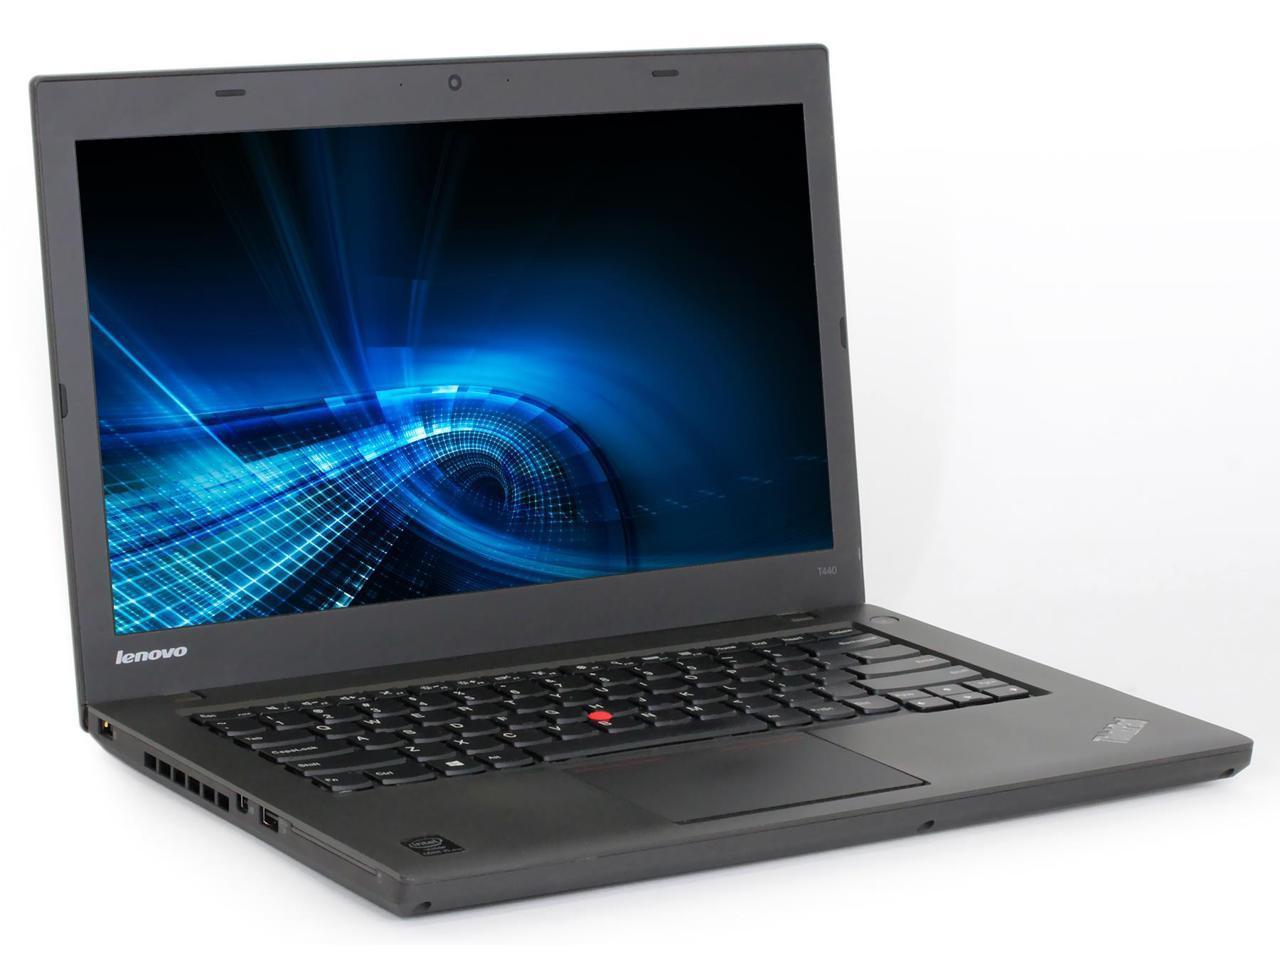 IBM Lenovo Thinkpad T440 Laptop Core i5 1.9GHz, 8GB Ram, 250GB SSD, Windows 10 Pro 64 Notebook